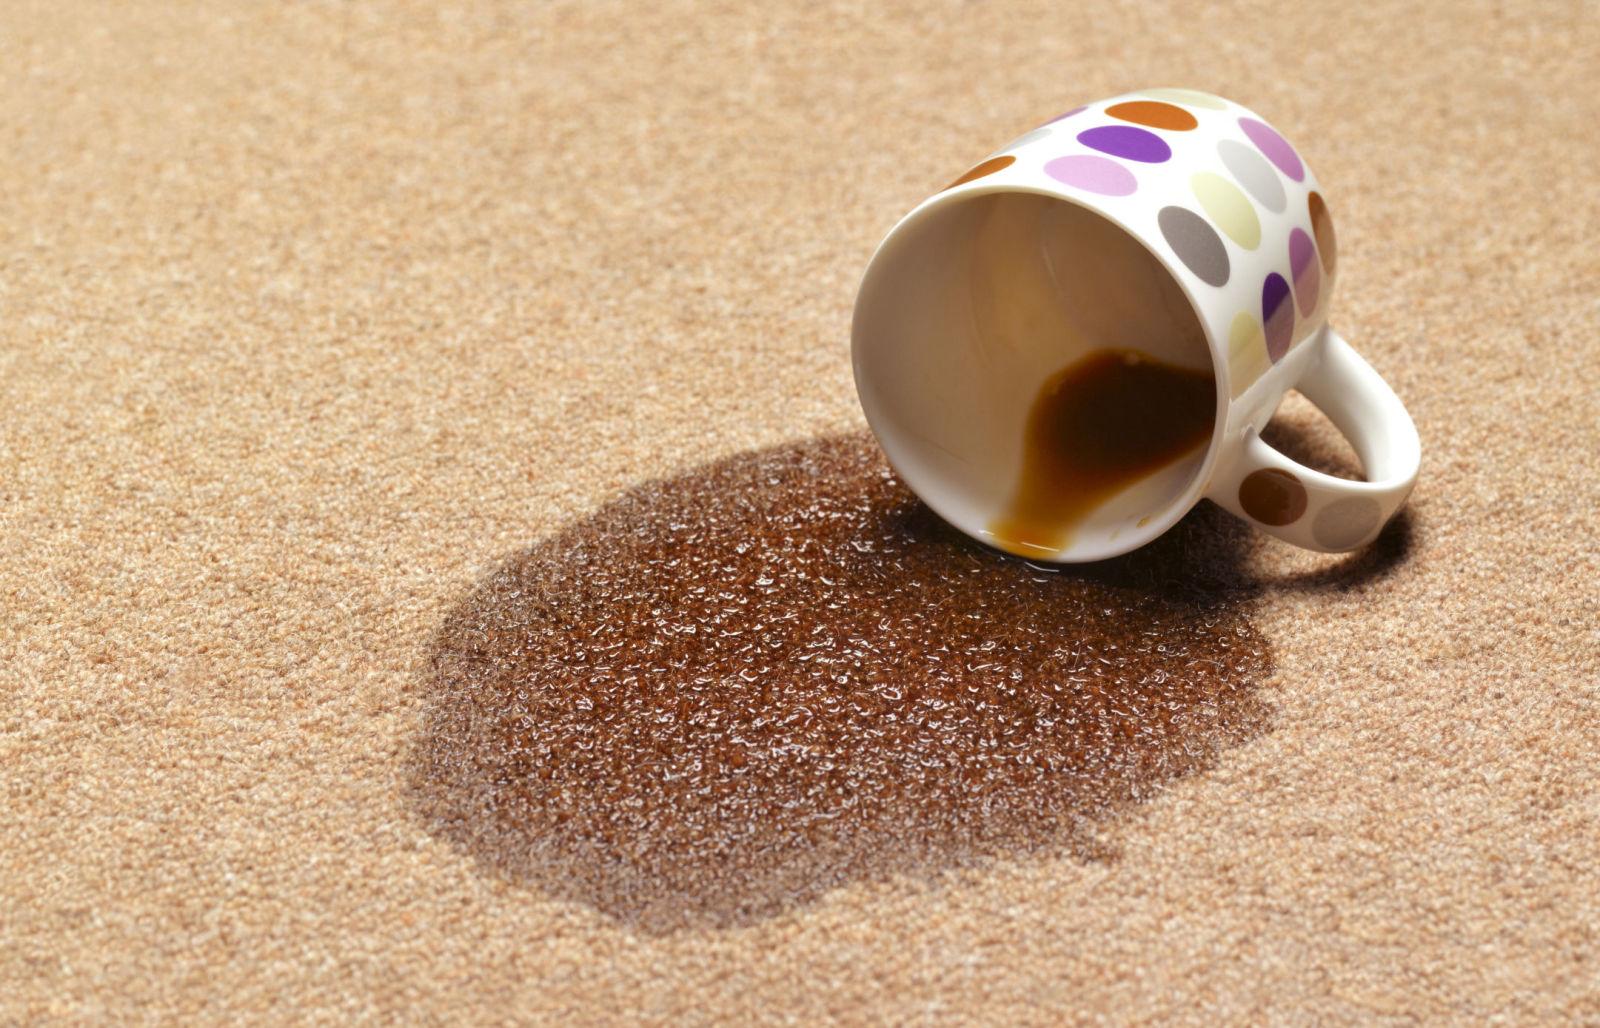 gallery-1438013889-coffee-stain-buster.jpg